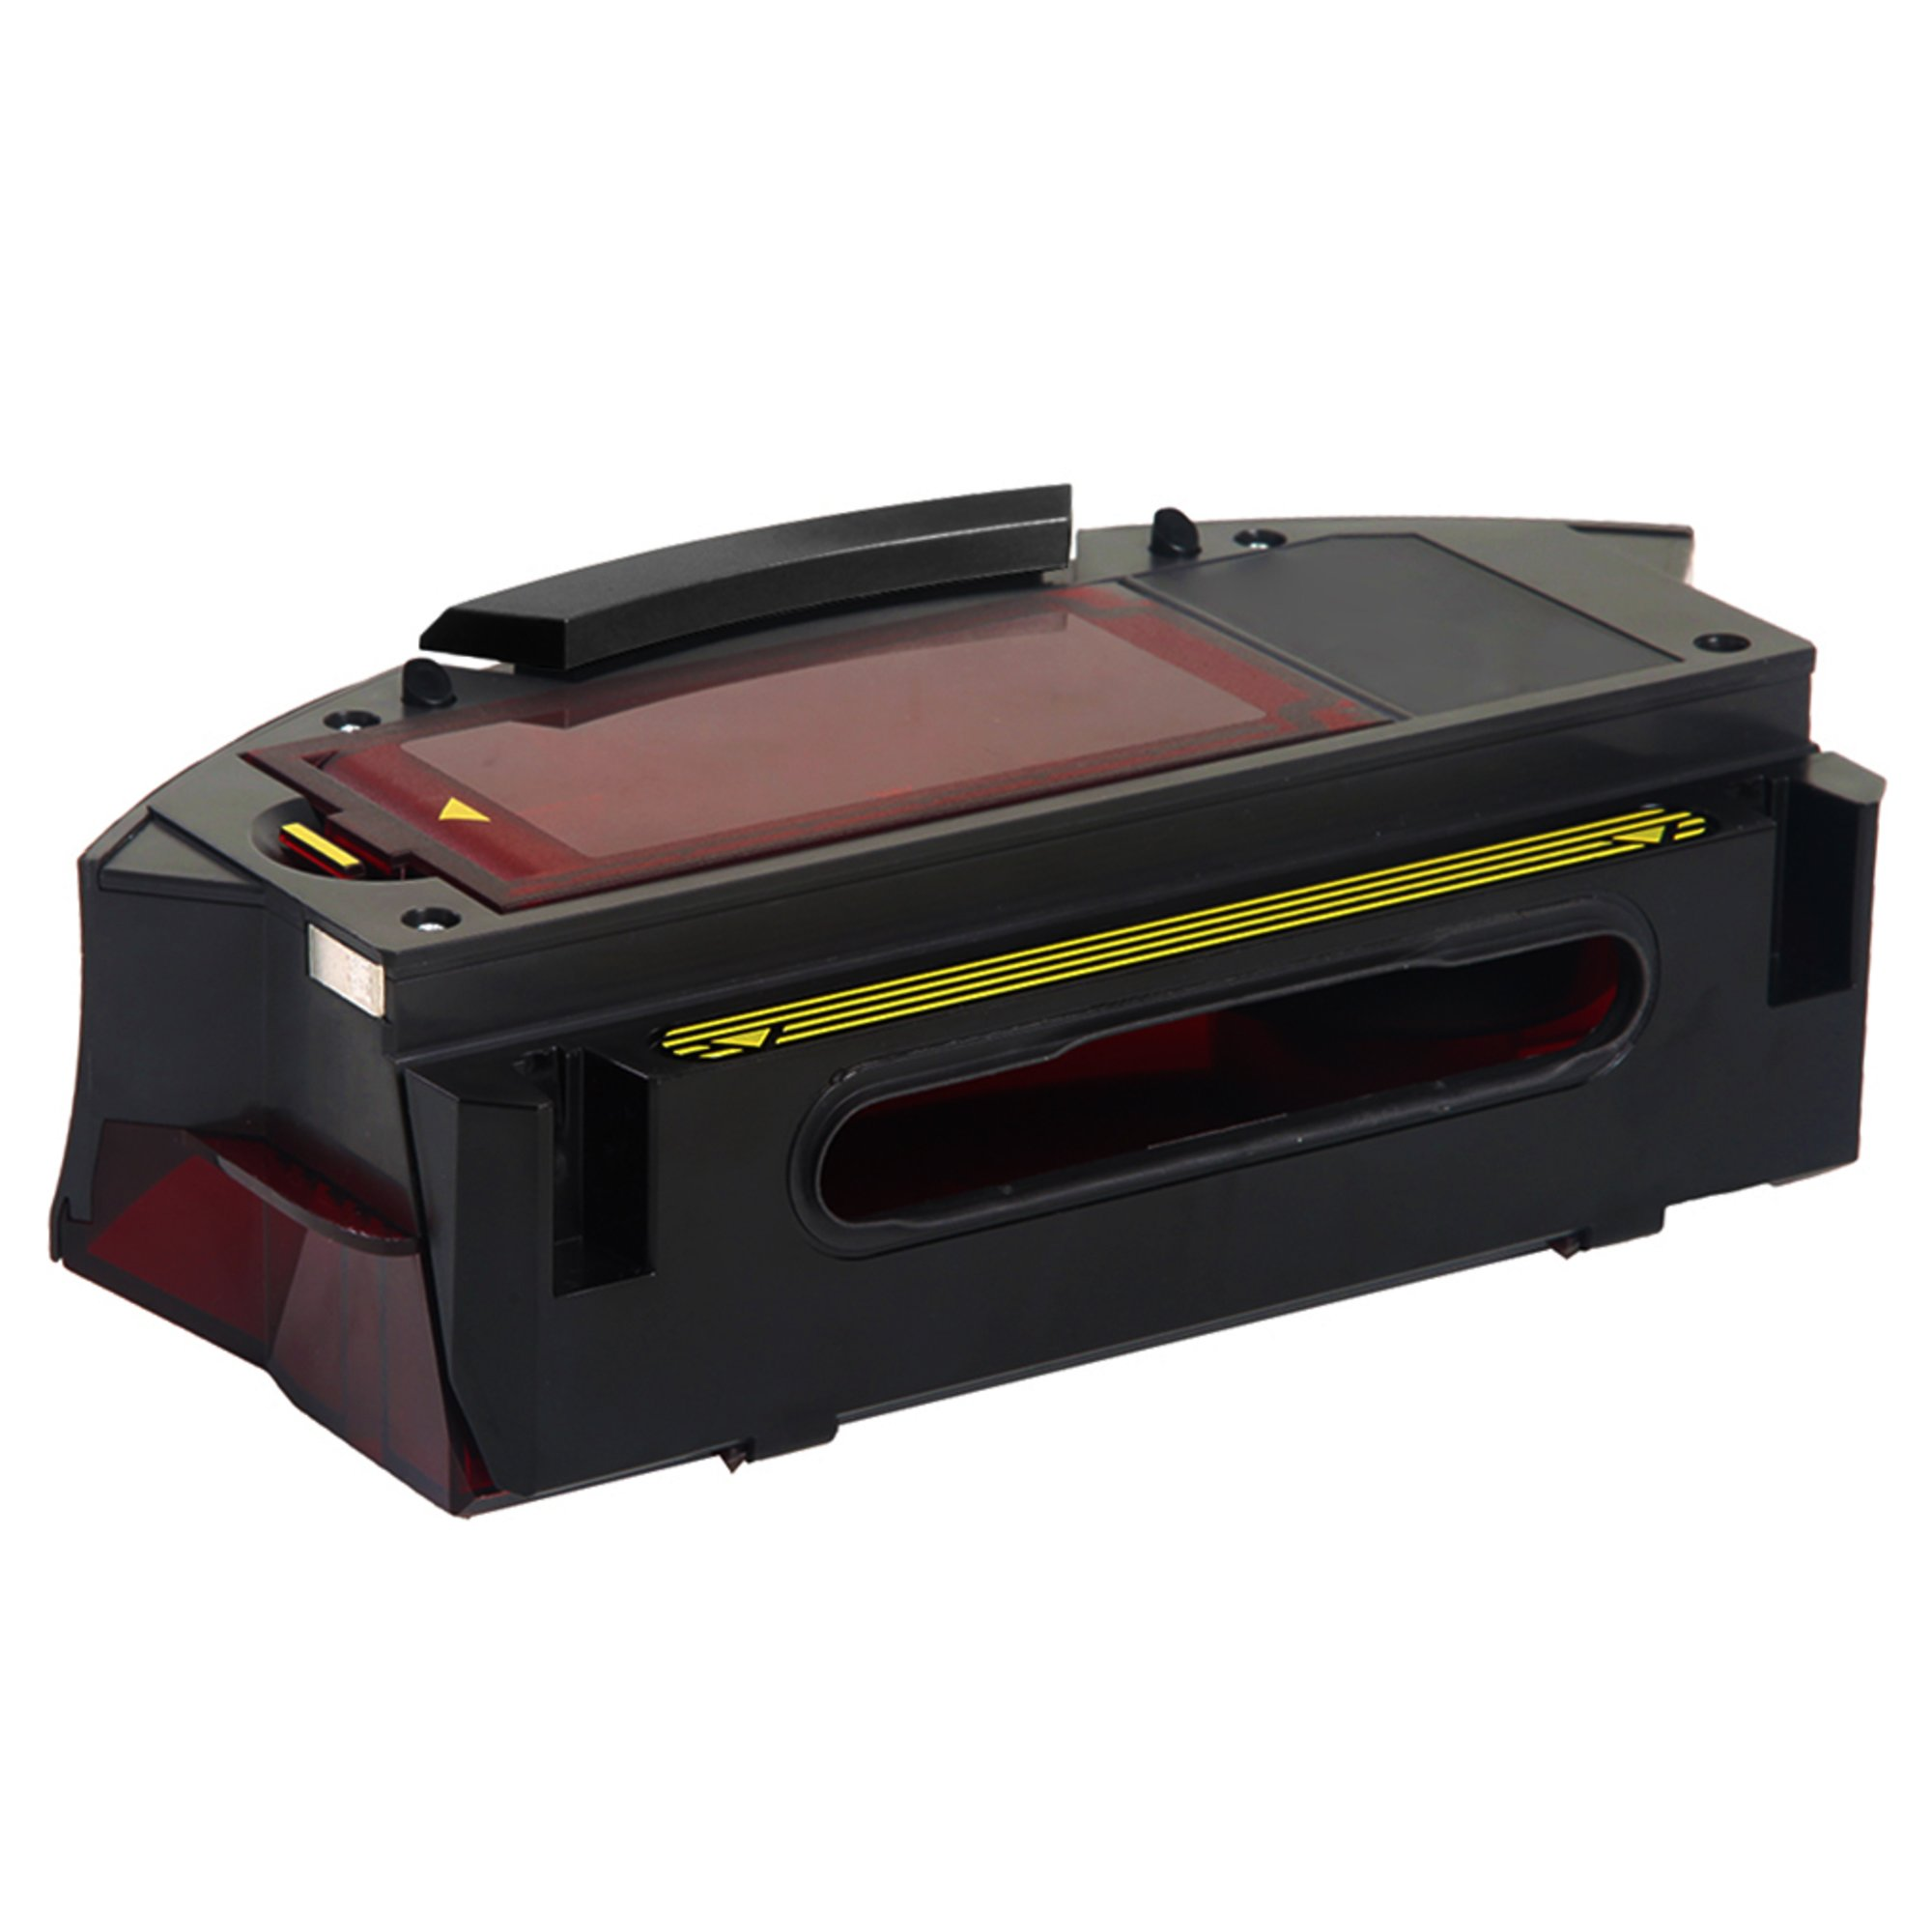 iRobot Dammbehållare till Roomba 966